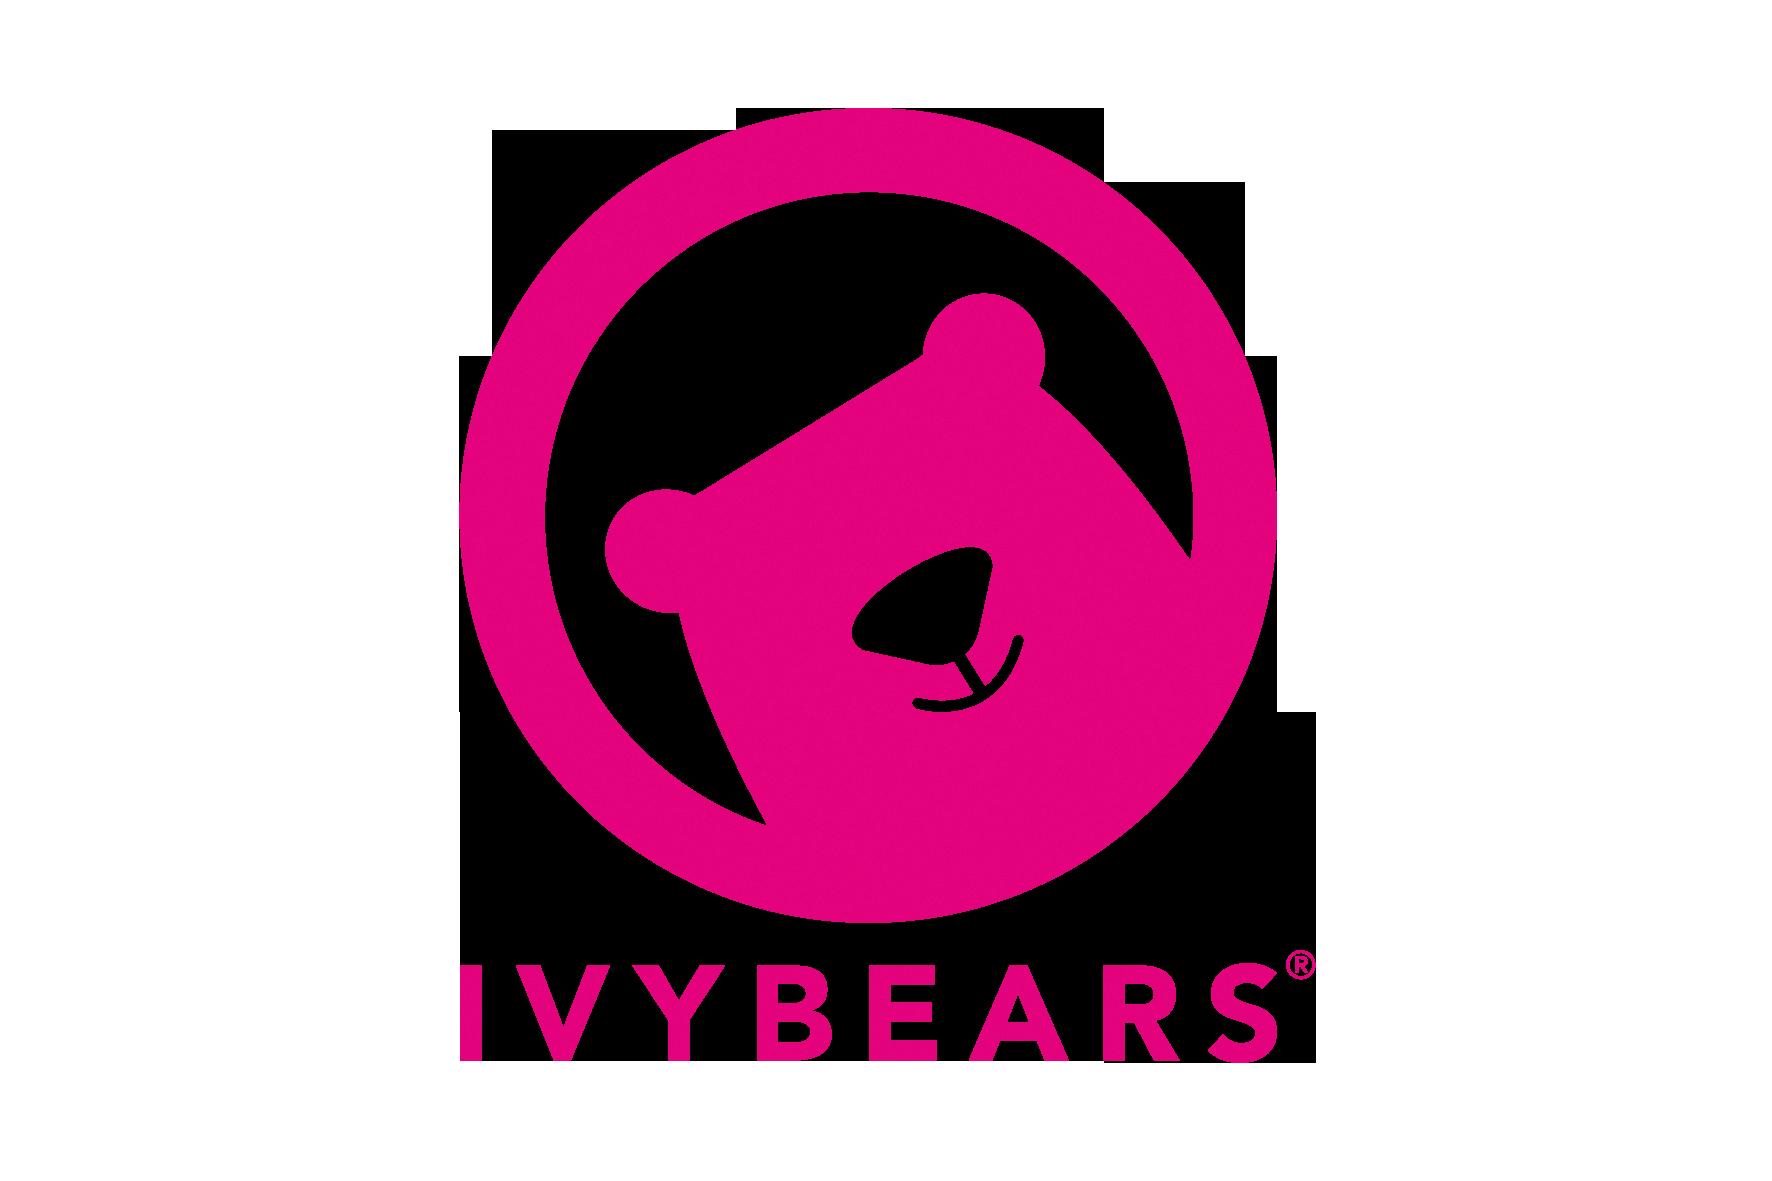 Ivybears Vitamins